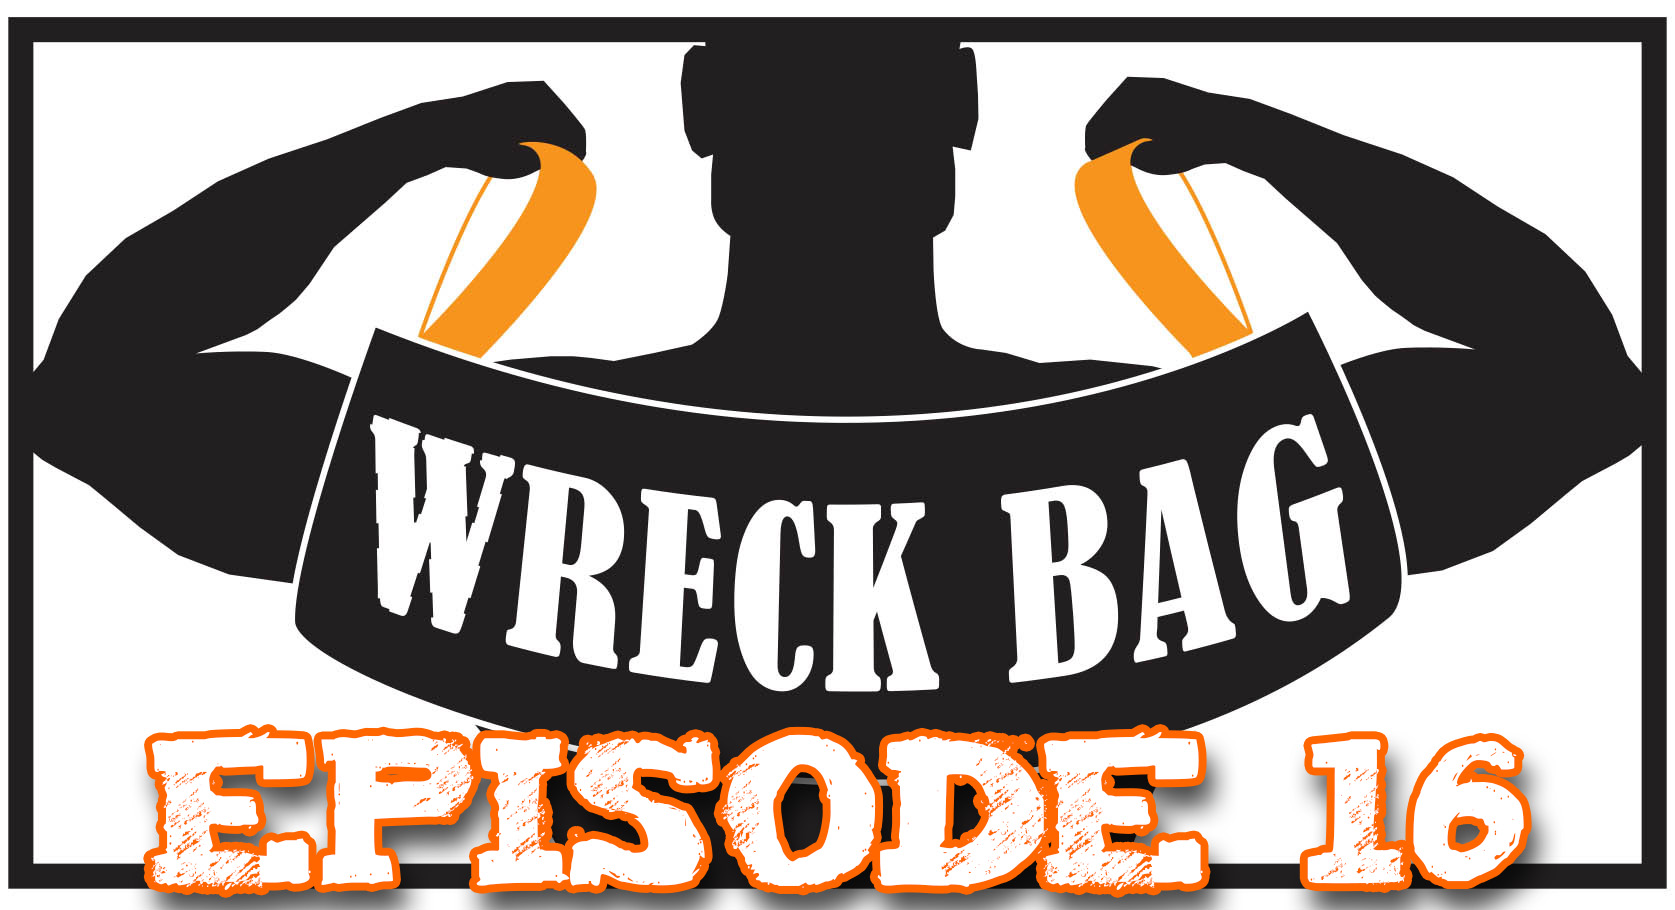 episode 16 wreck bag \u2013 new england spahtensepisode 16 wreck bag